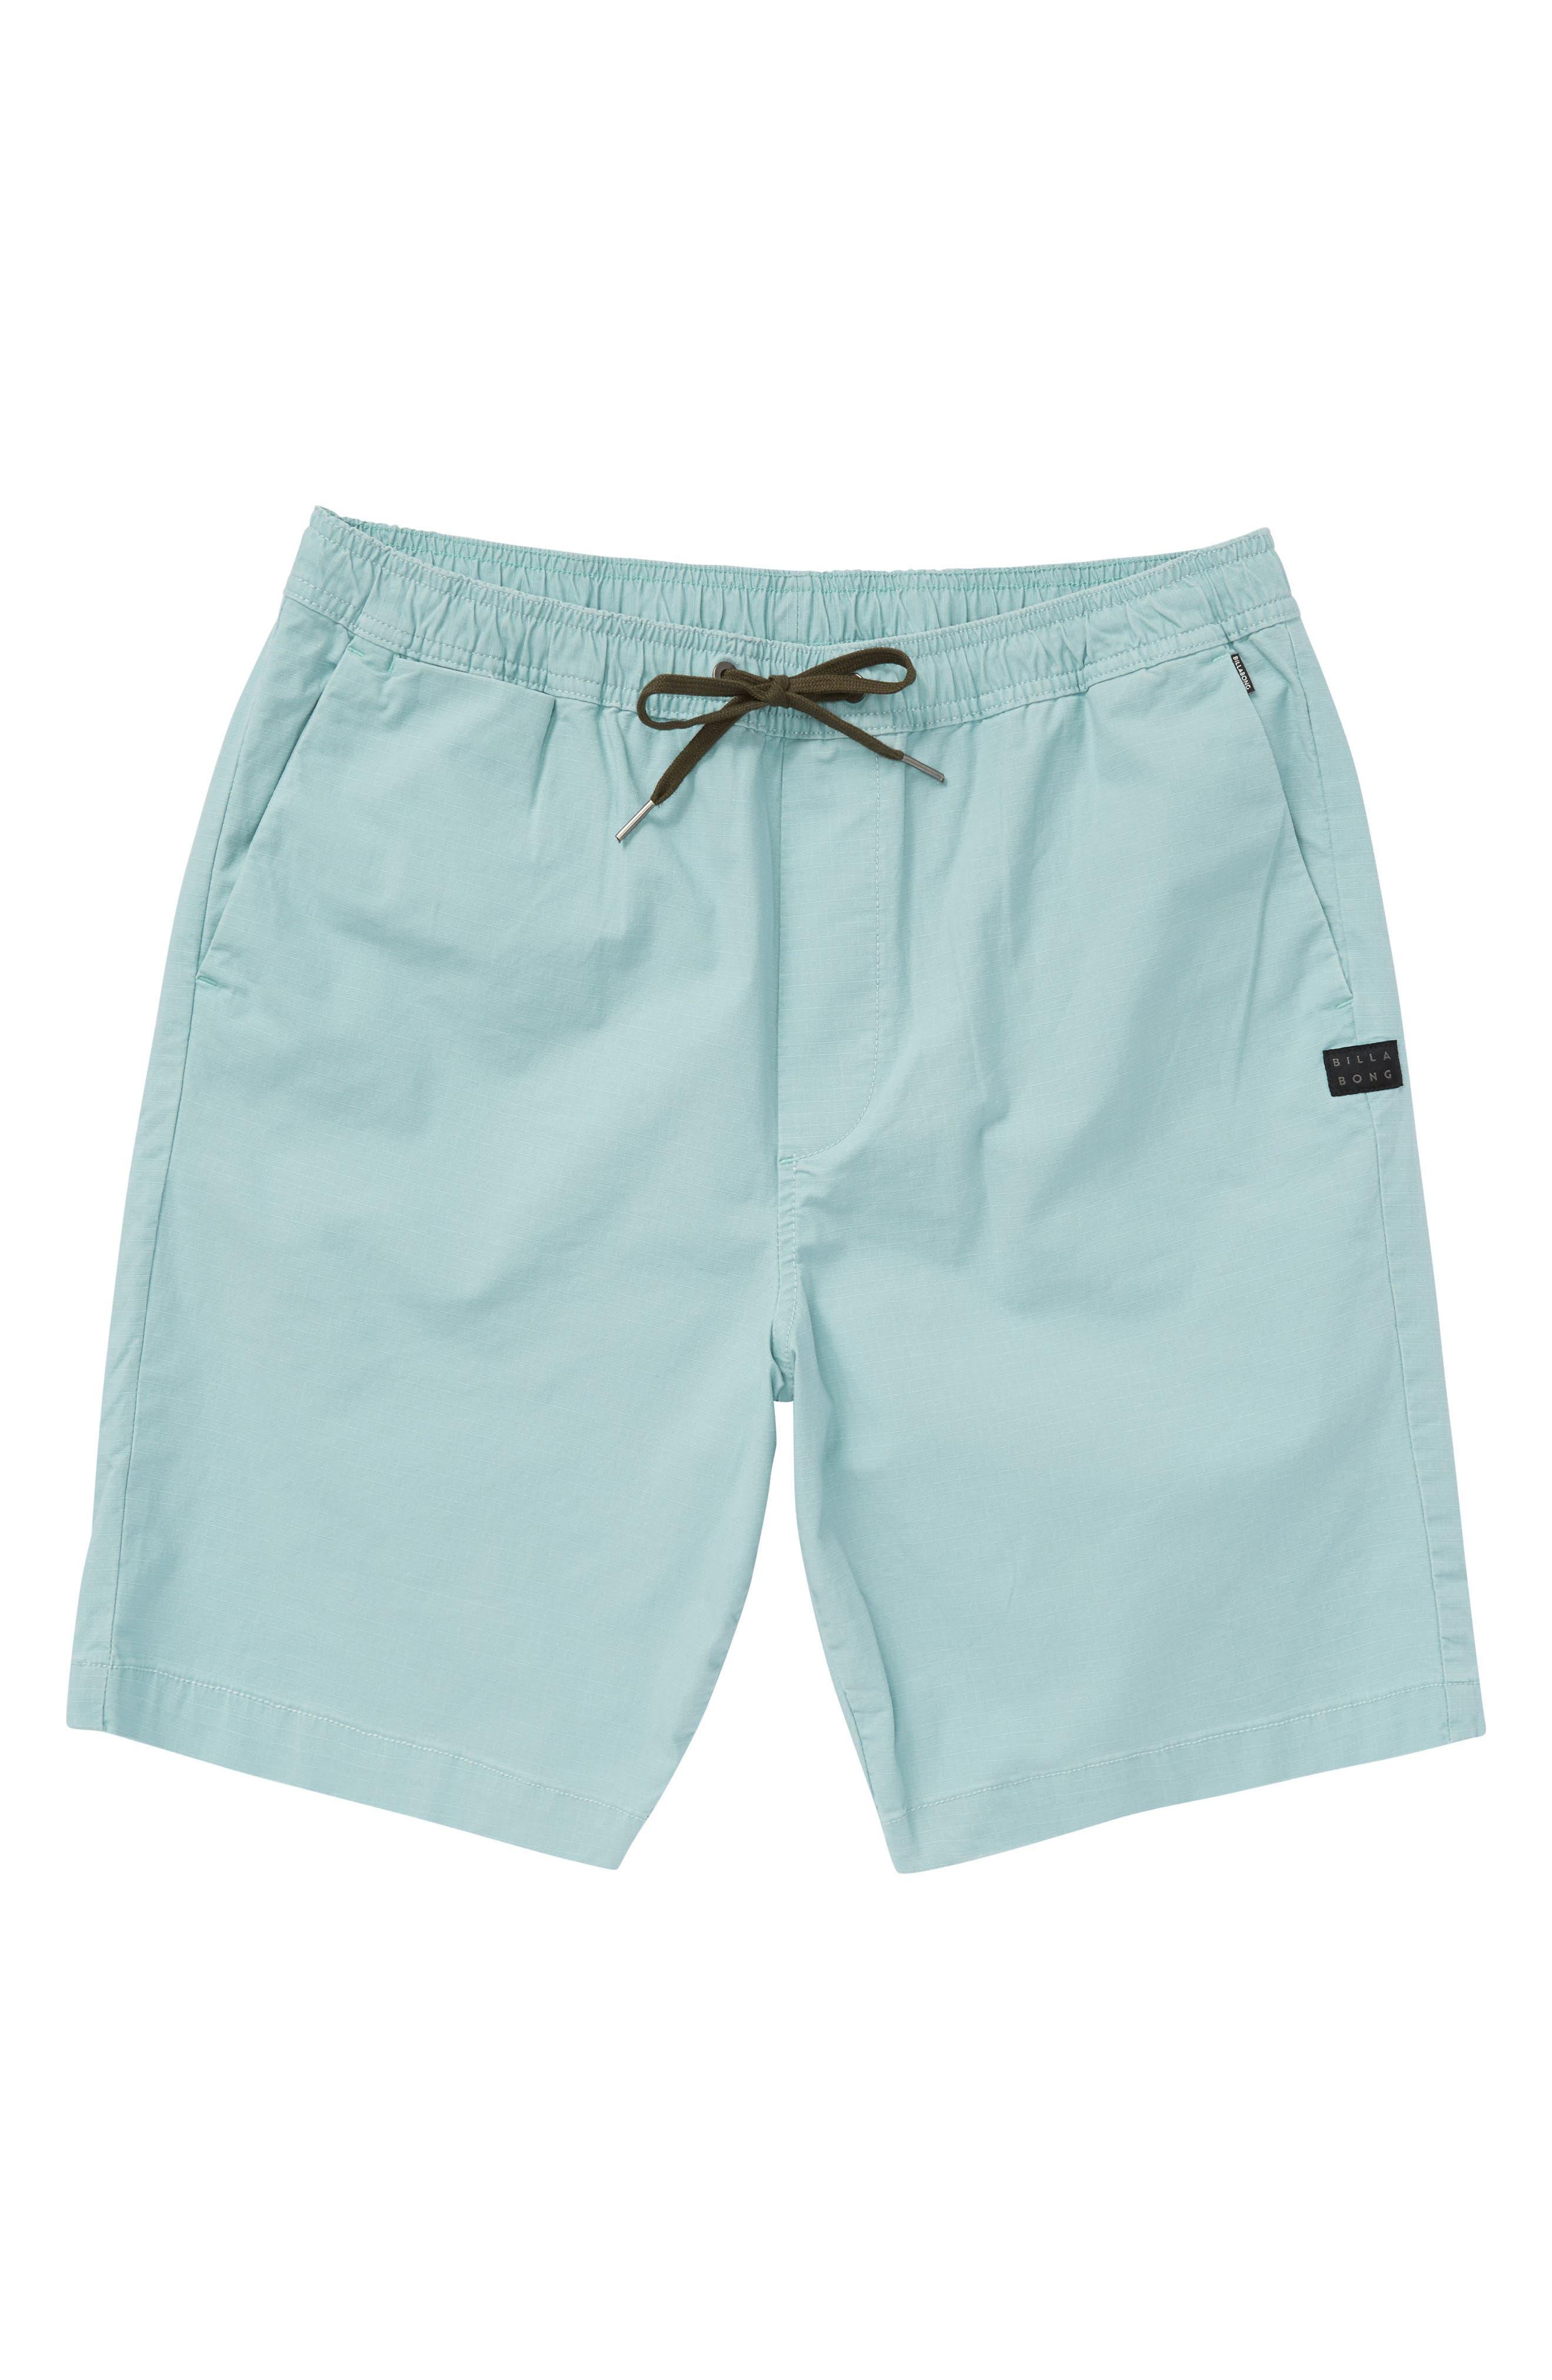 Billabong Larry Layback Shorts (Toddler Boys)